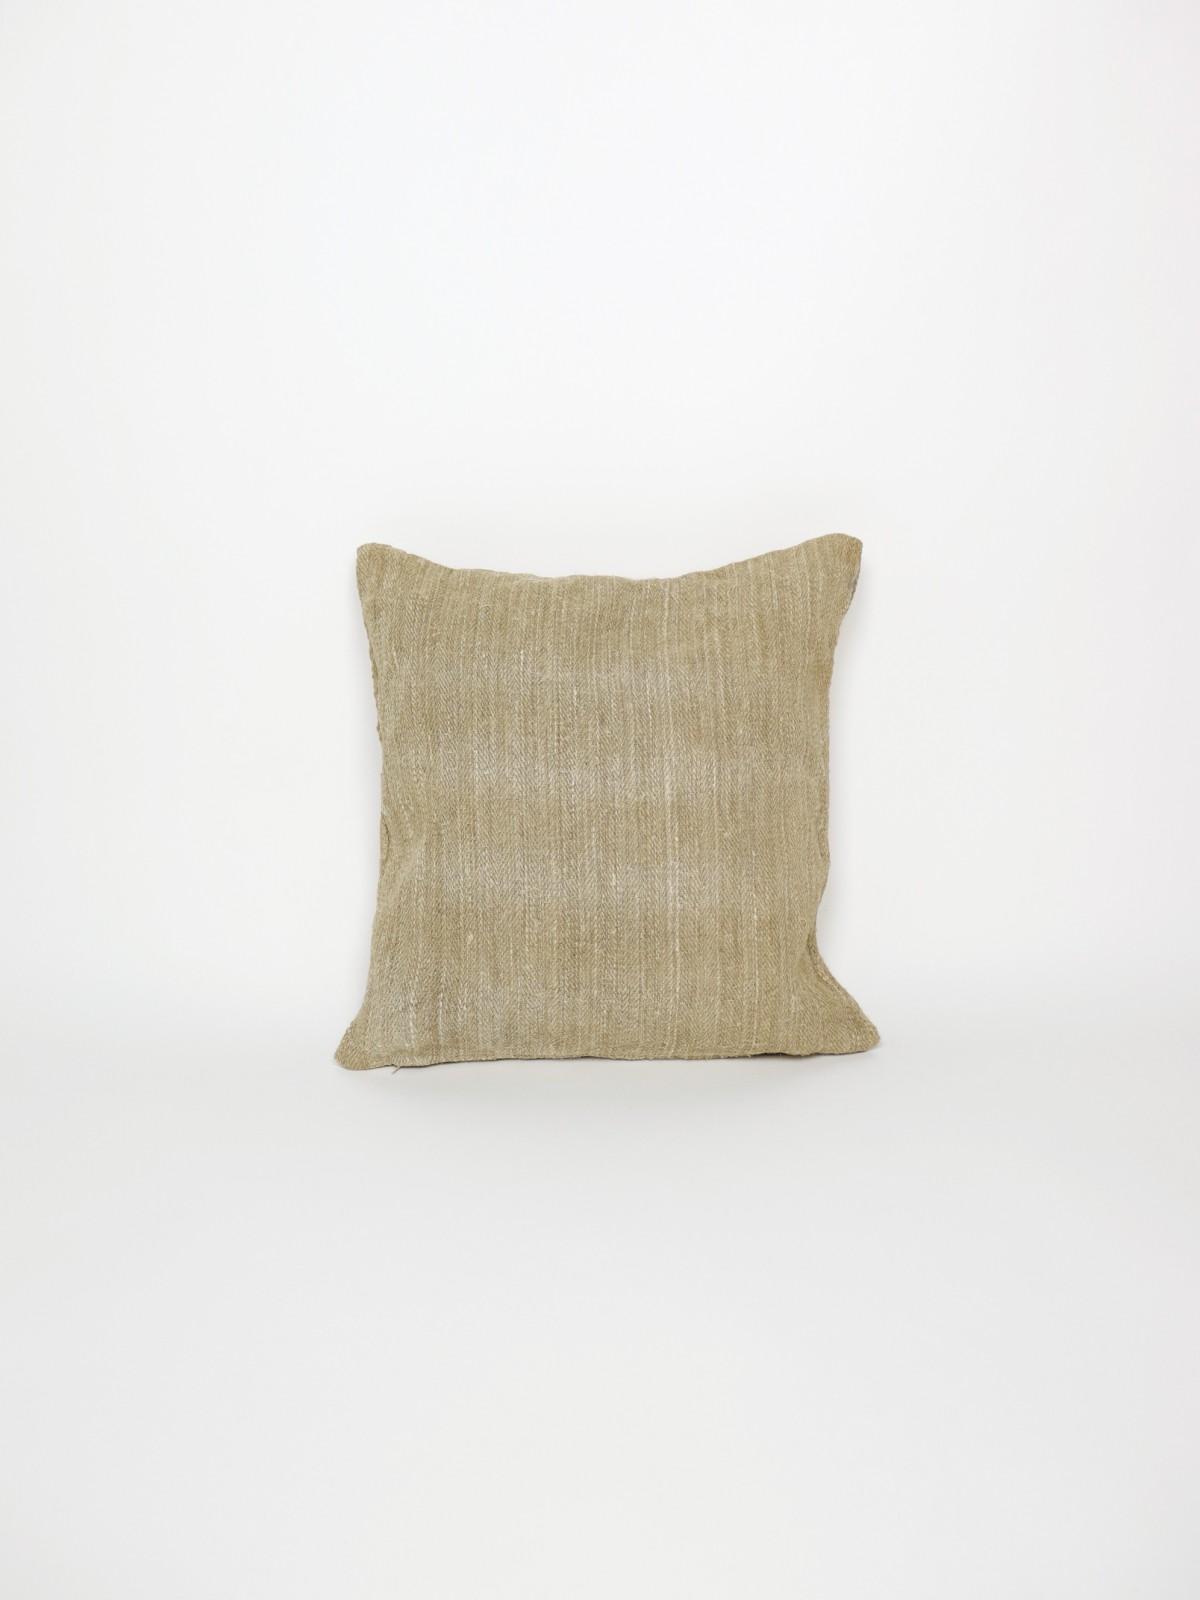 1950's grain sack cushion, vintage hemp fabric cushion, brown.remake